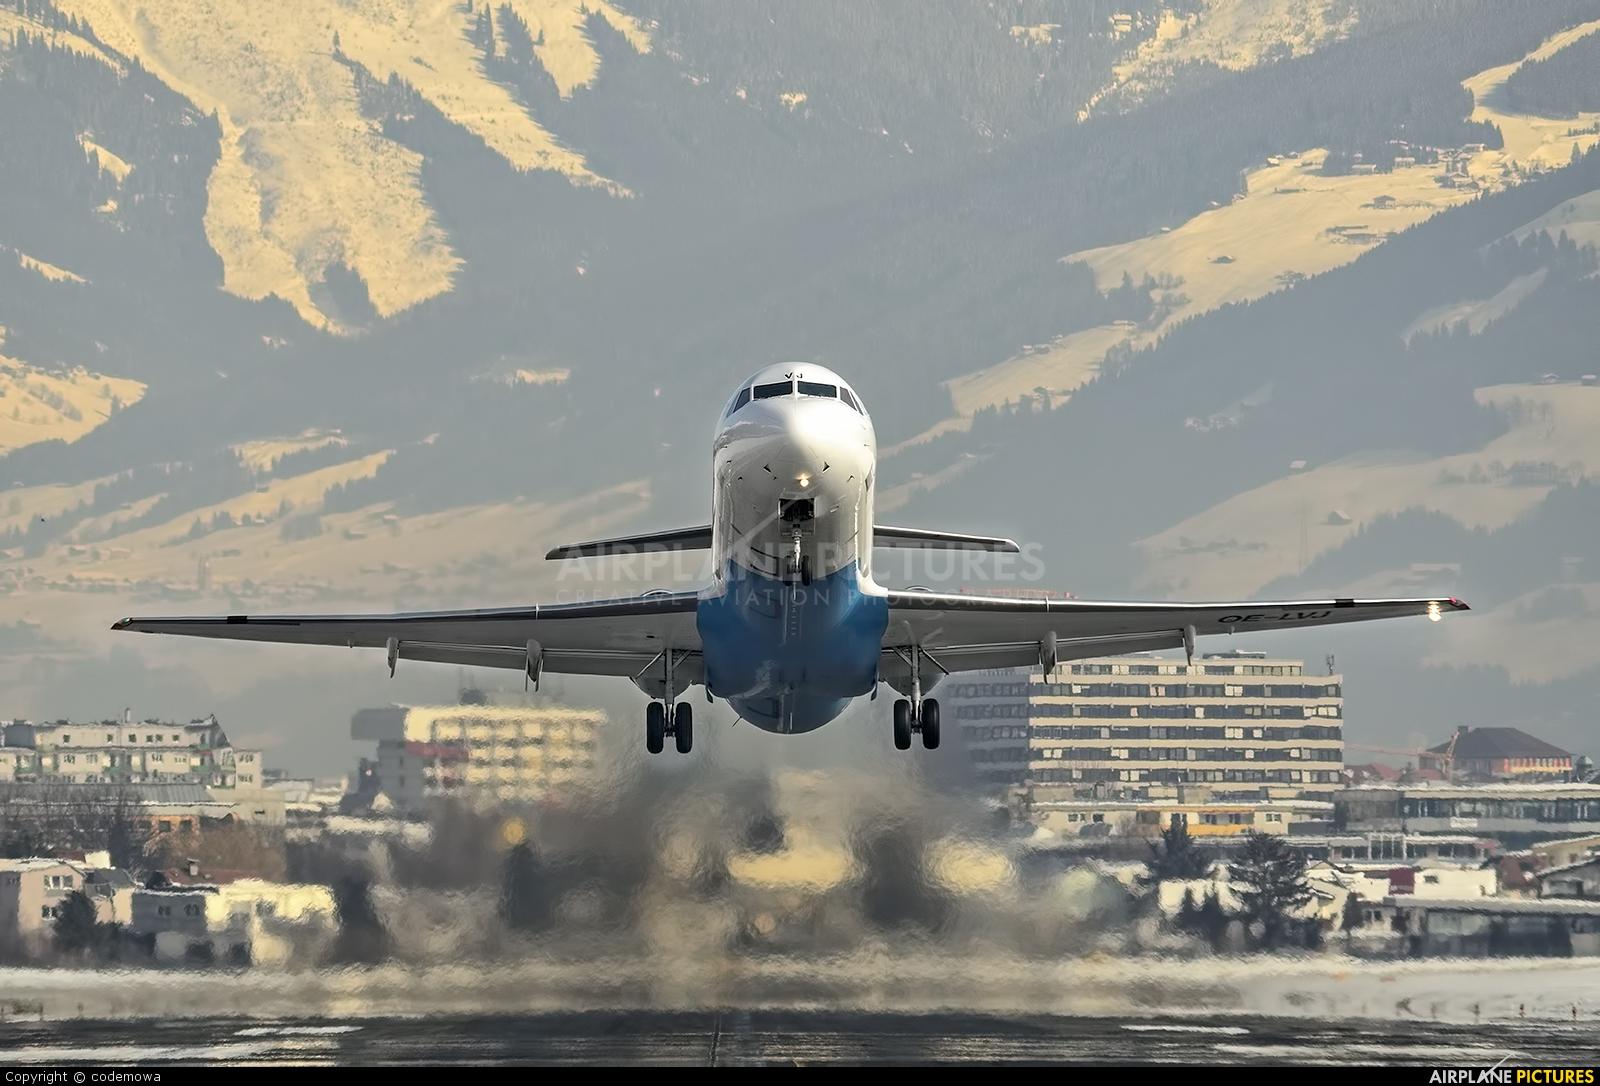 Austrian Airlines/Arrows/Tyrolean OE-LVJ aircraft at Innsbruck